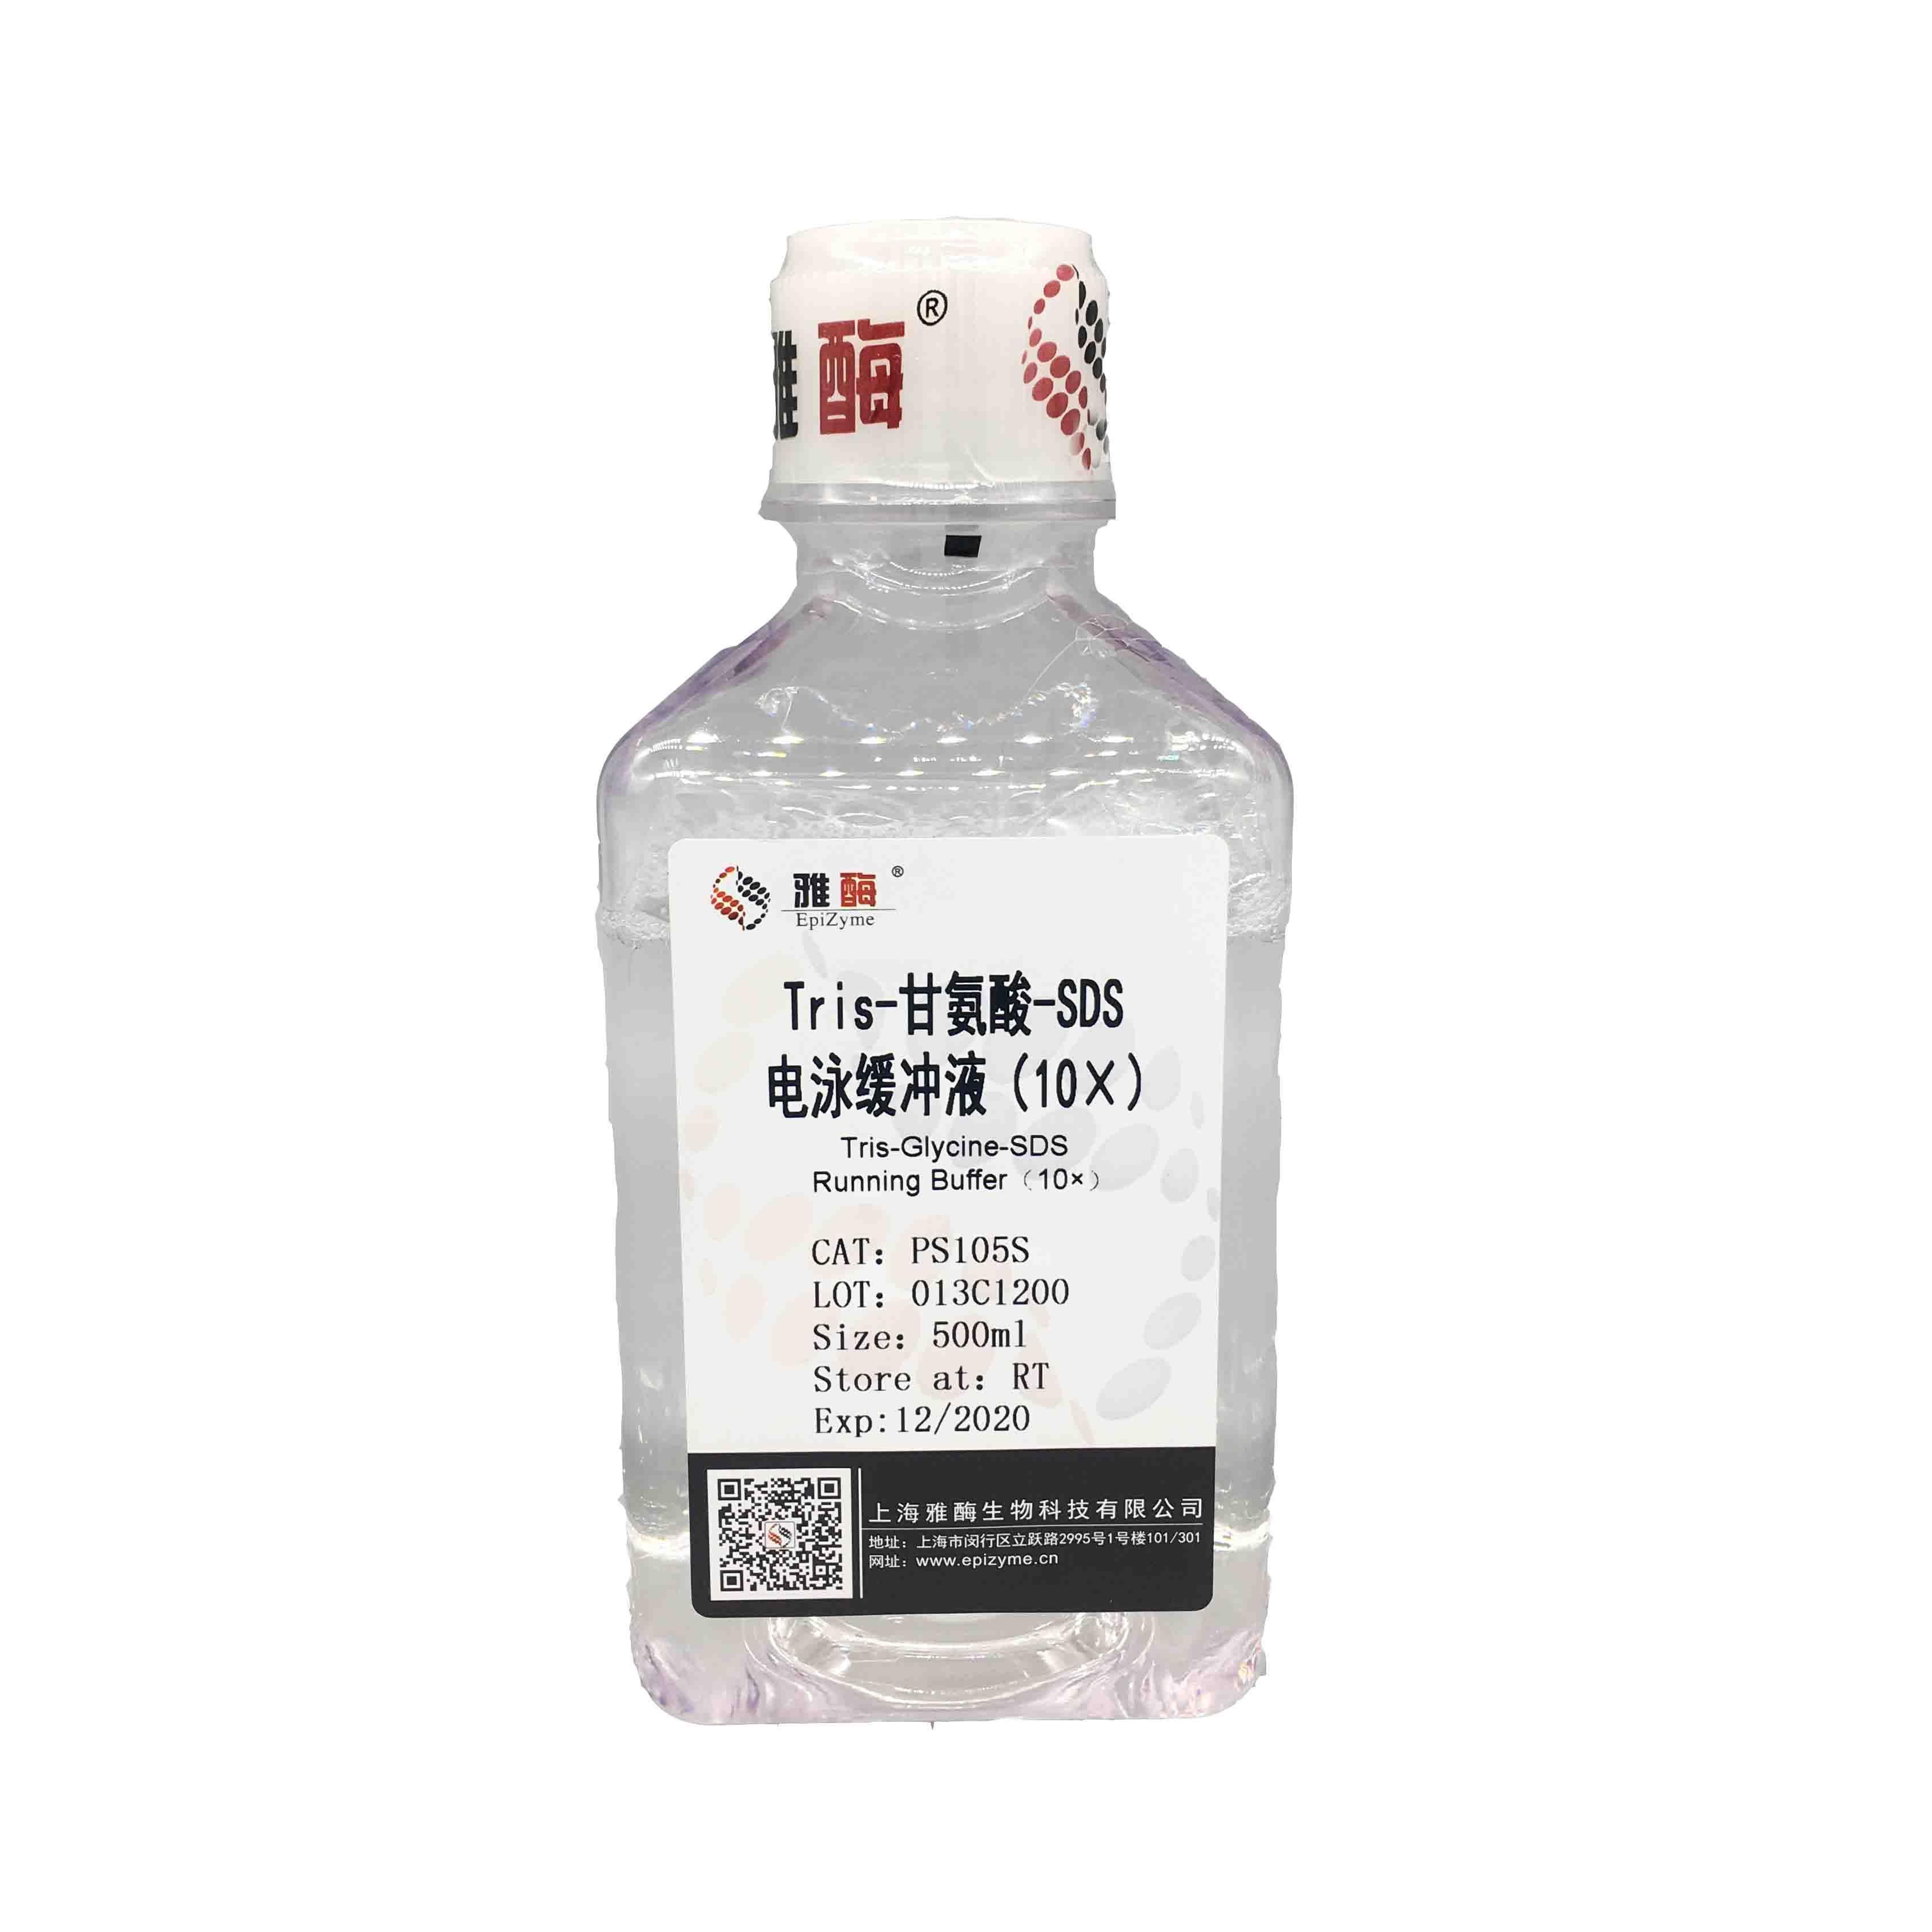 PS105S Tris/甘氨酸/SDS 电泳缓冲液(10×) 500ml